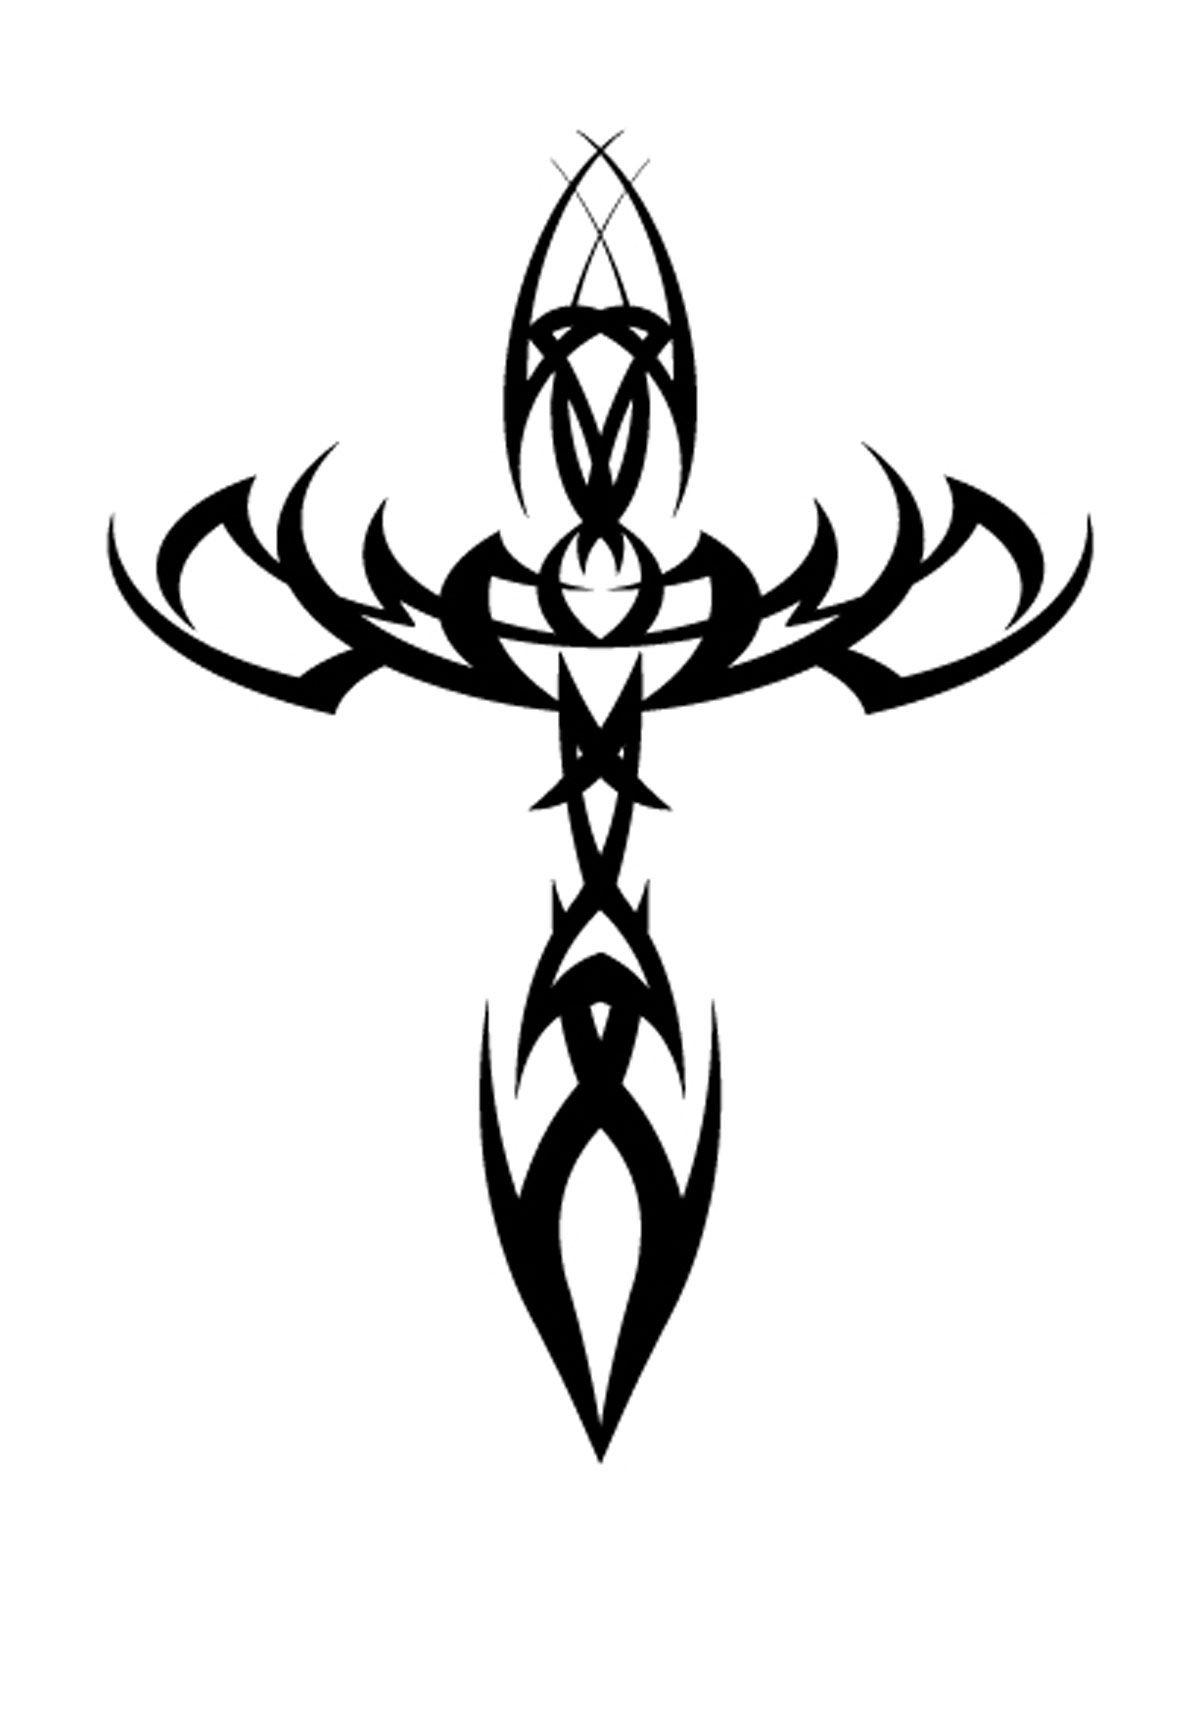 Tribal Tattoo for Men tats Maori Croix Coloriage